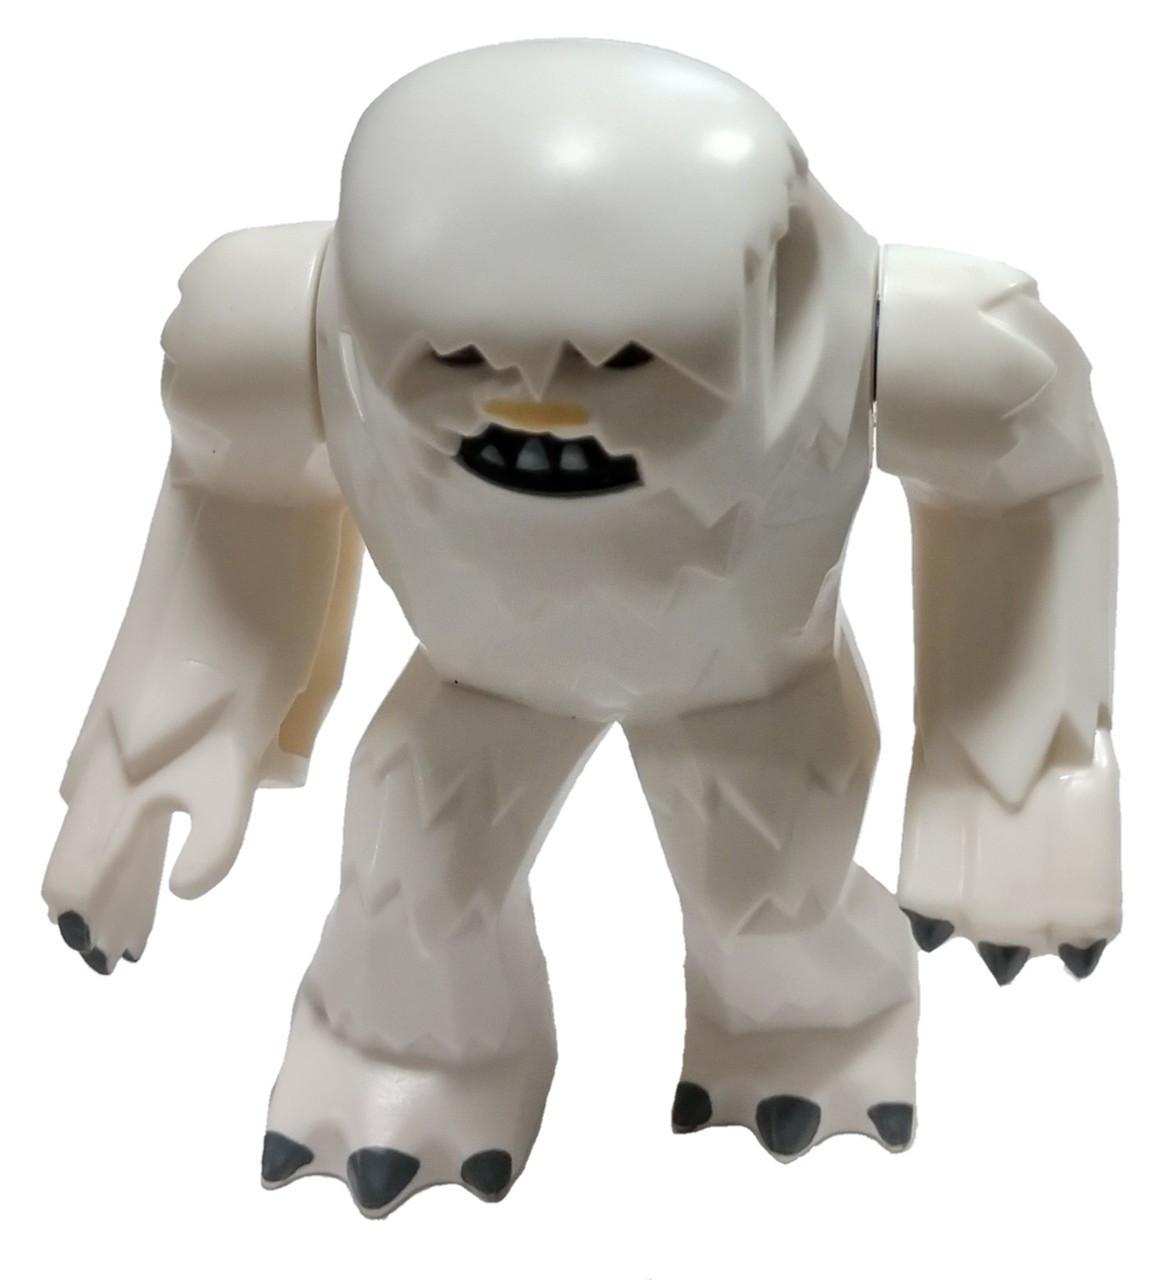 LEGO Star Wars Empire Strikes Back Wampa Minifigure Without Horns Loose -  ToyWiz 42e8002b34e